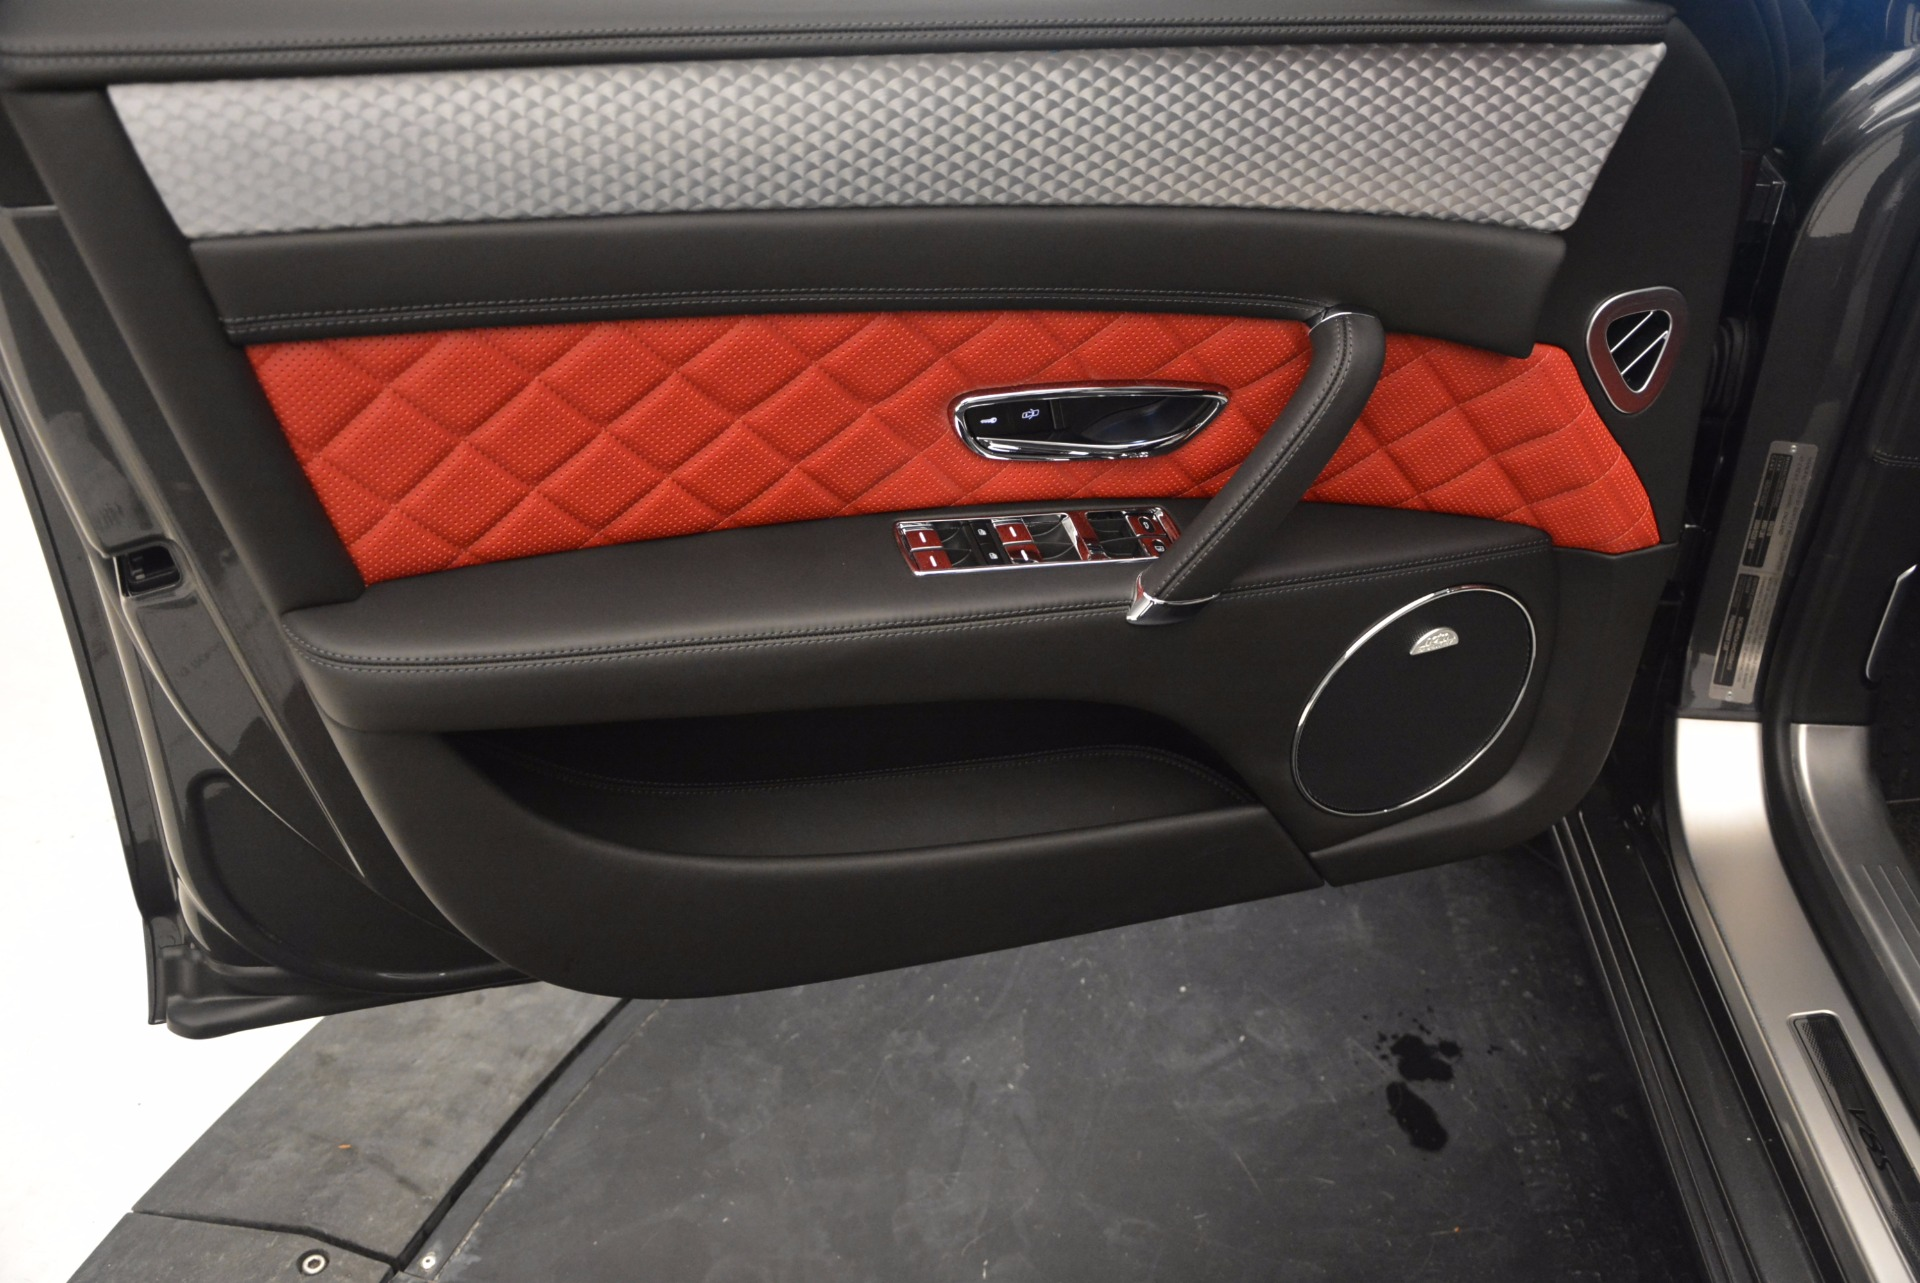 Used 2017 Bentley Flying Spur V8 S For Sale In Westport, CT 875_p21